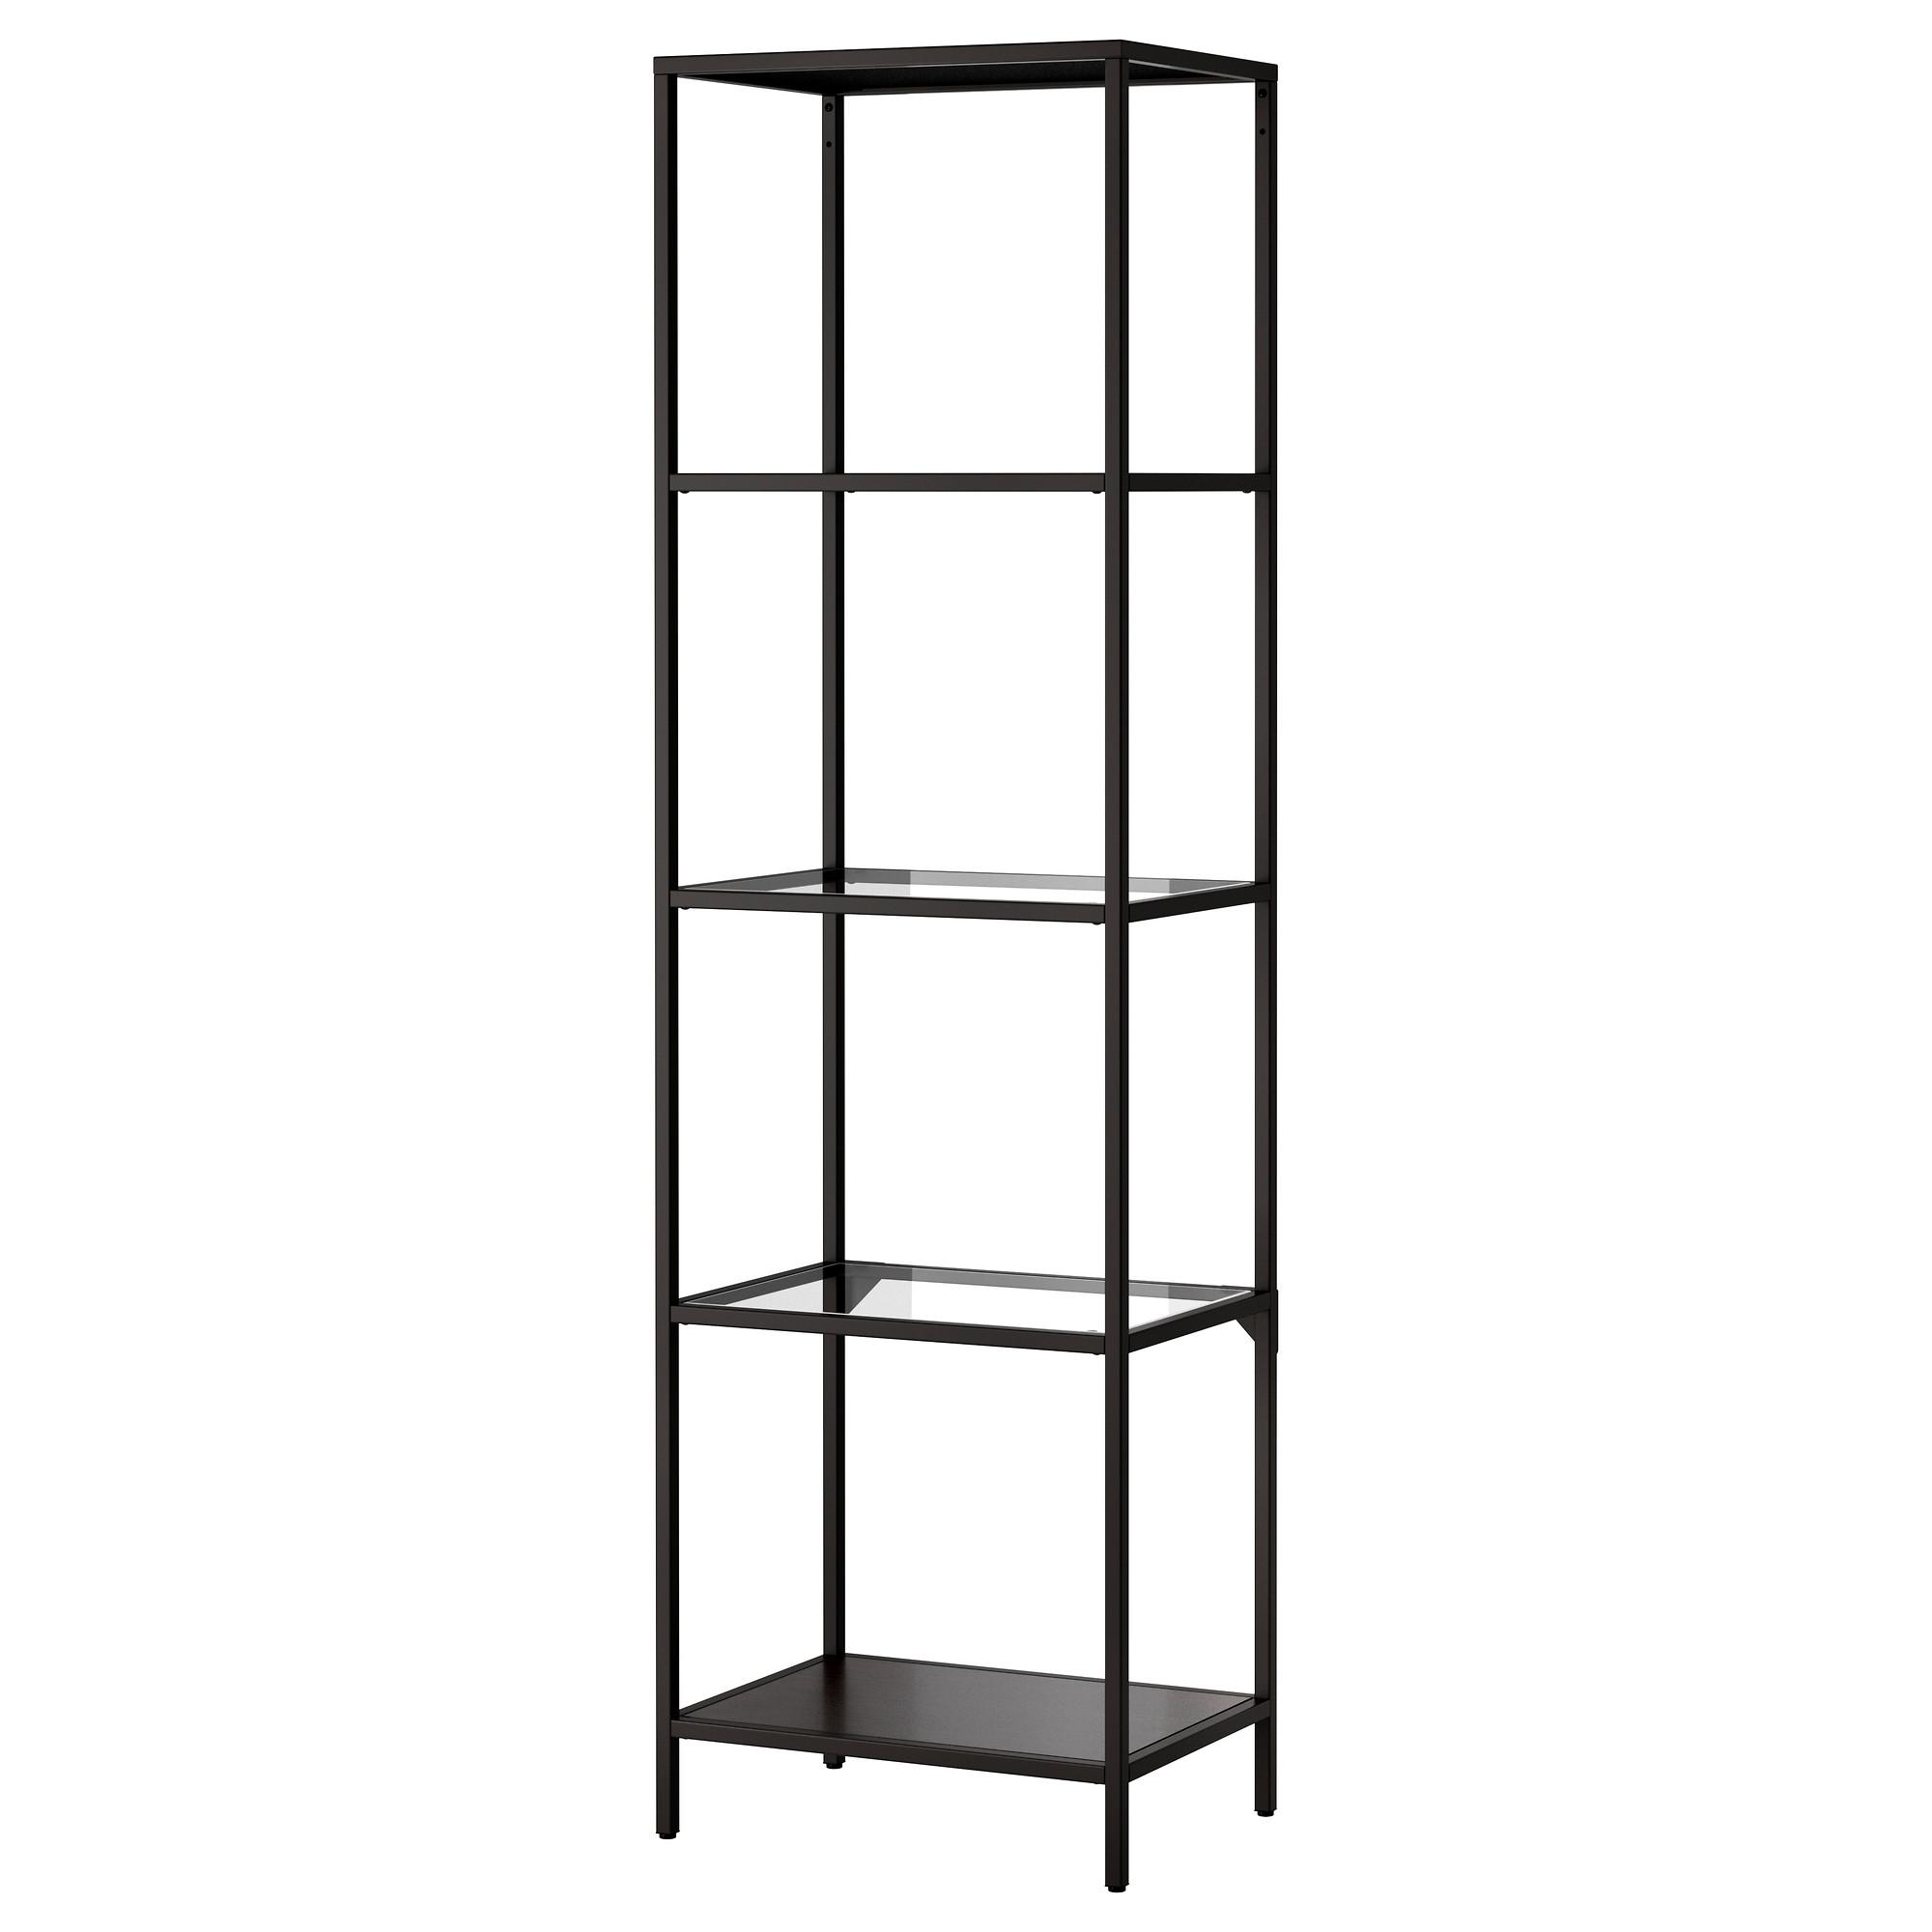 shelving units vittsjö shelf unit, black-brown, glass width: 20 1/8  BVJAXKA